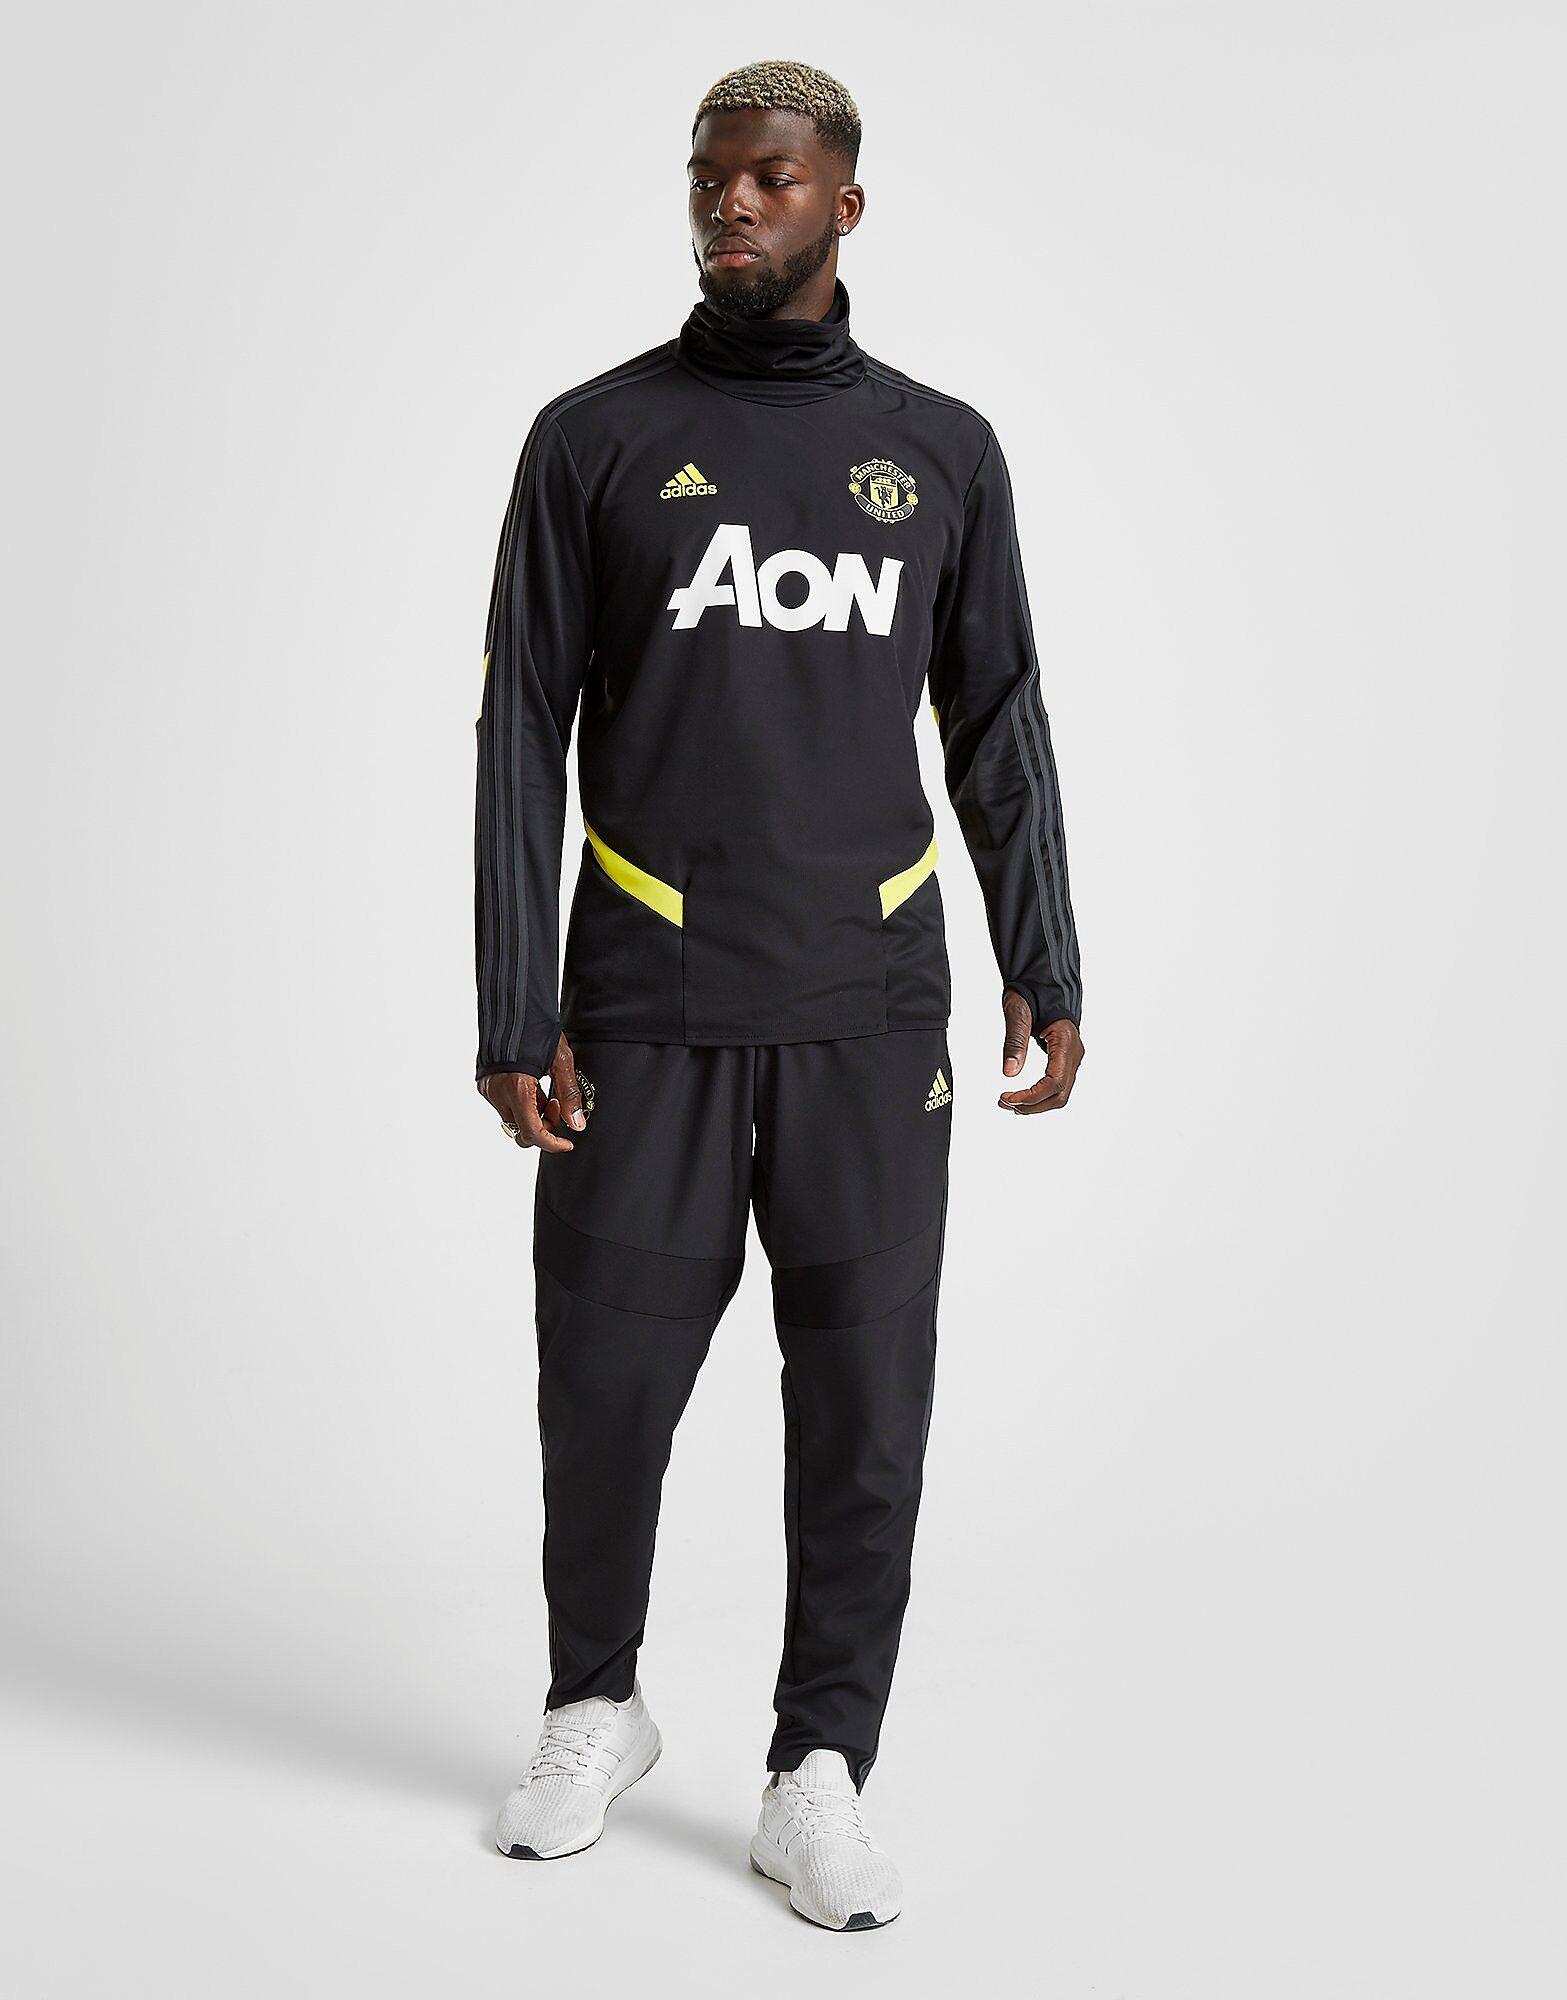 Image of Adidas Manchester United FC Verryttelyhousut Miehet - Mens, Musta